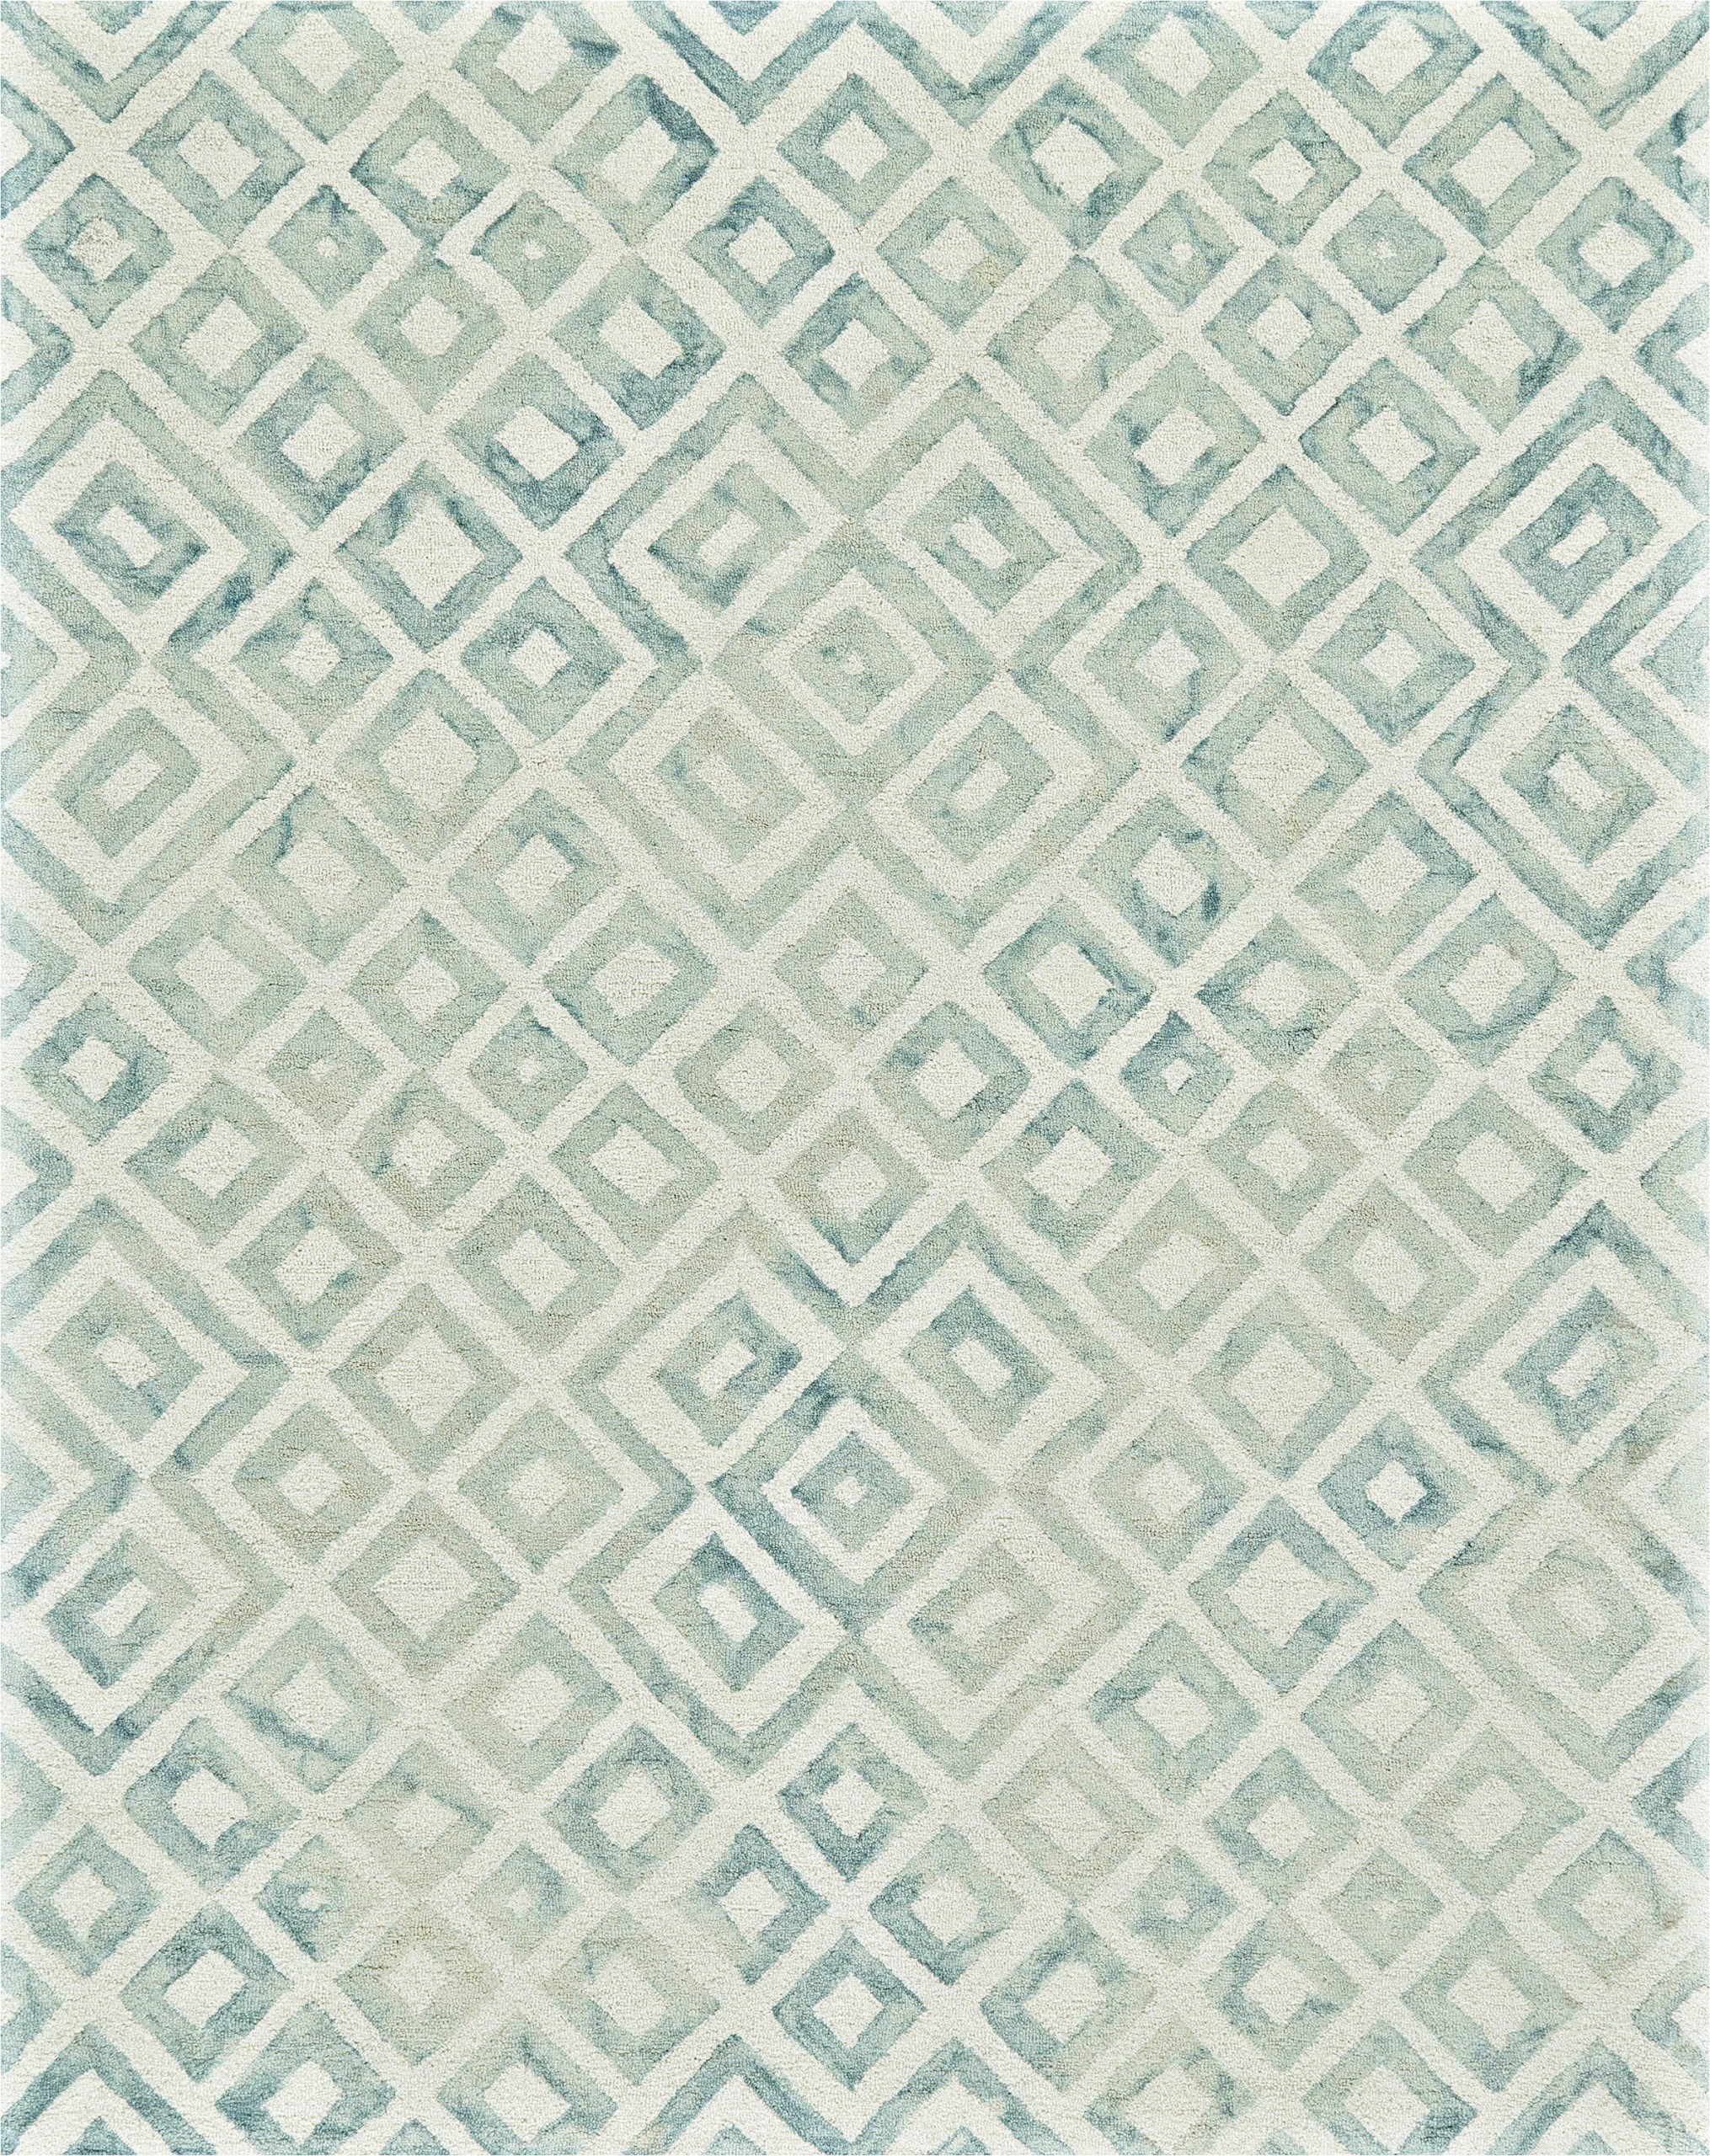 ebern designs frederick geometric hand hooked wool bluebeige area rug ebnd6366 piid=